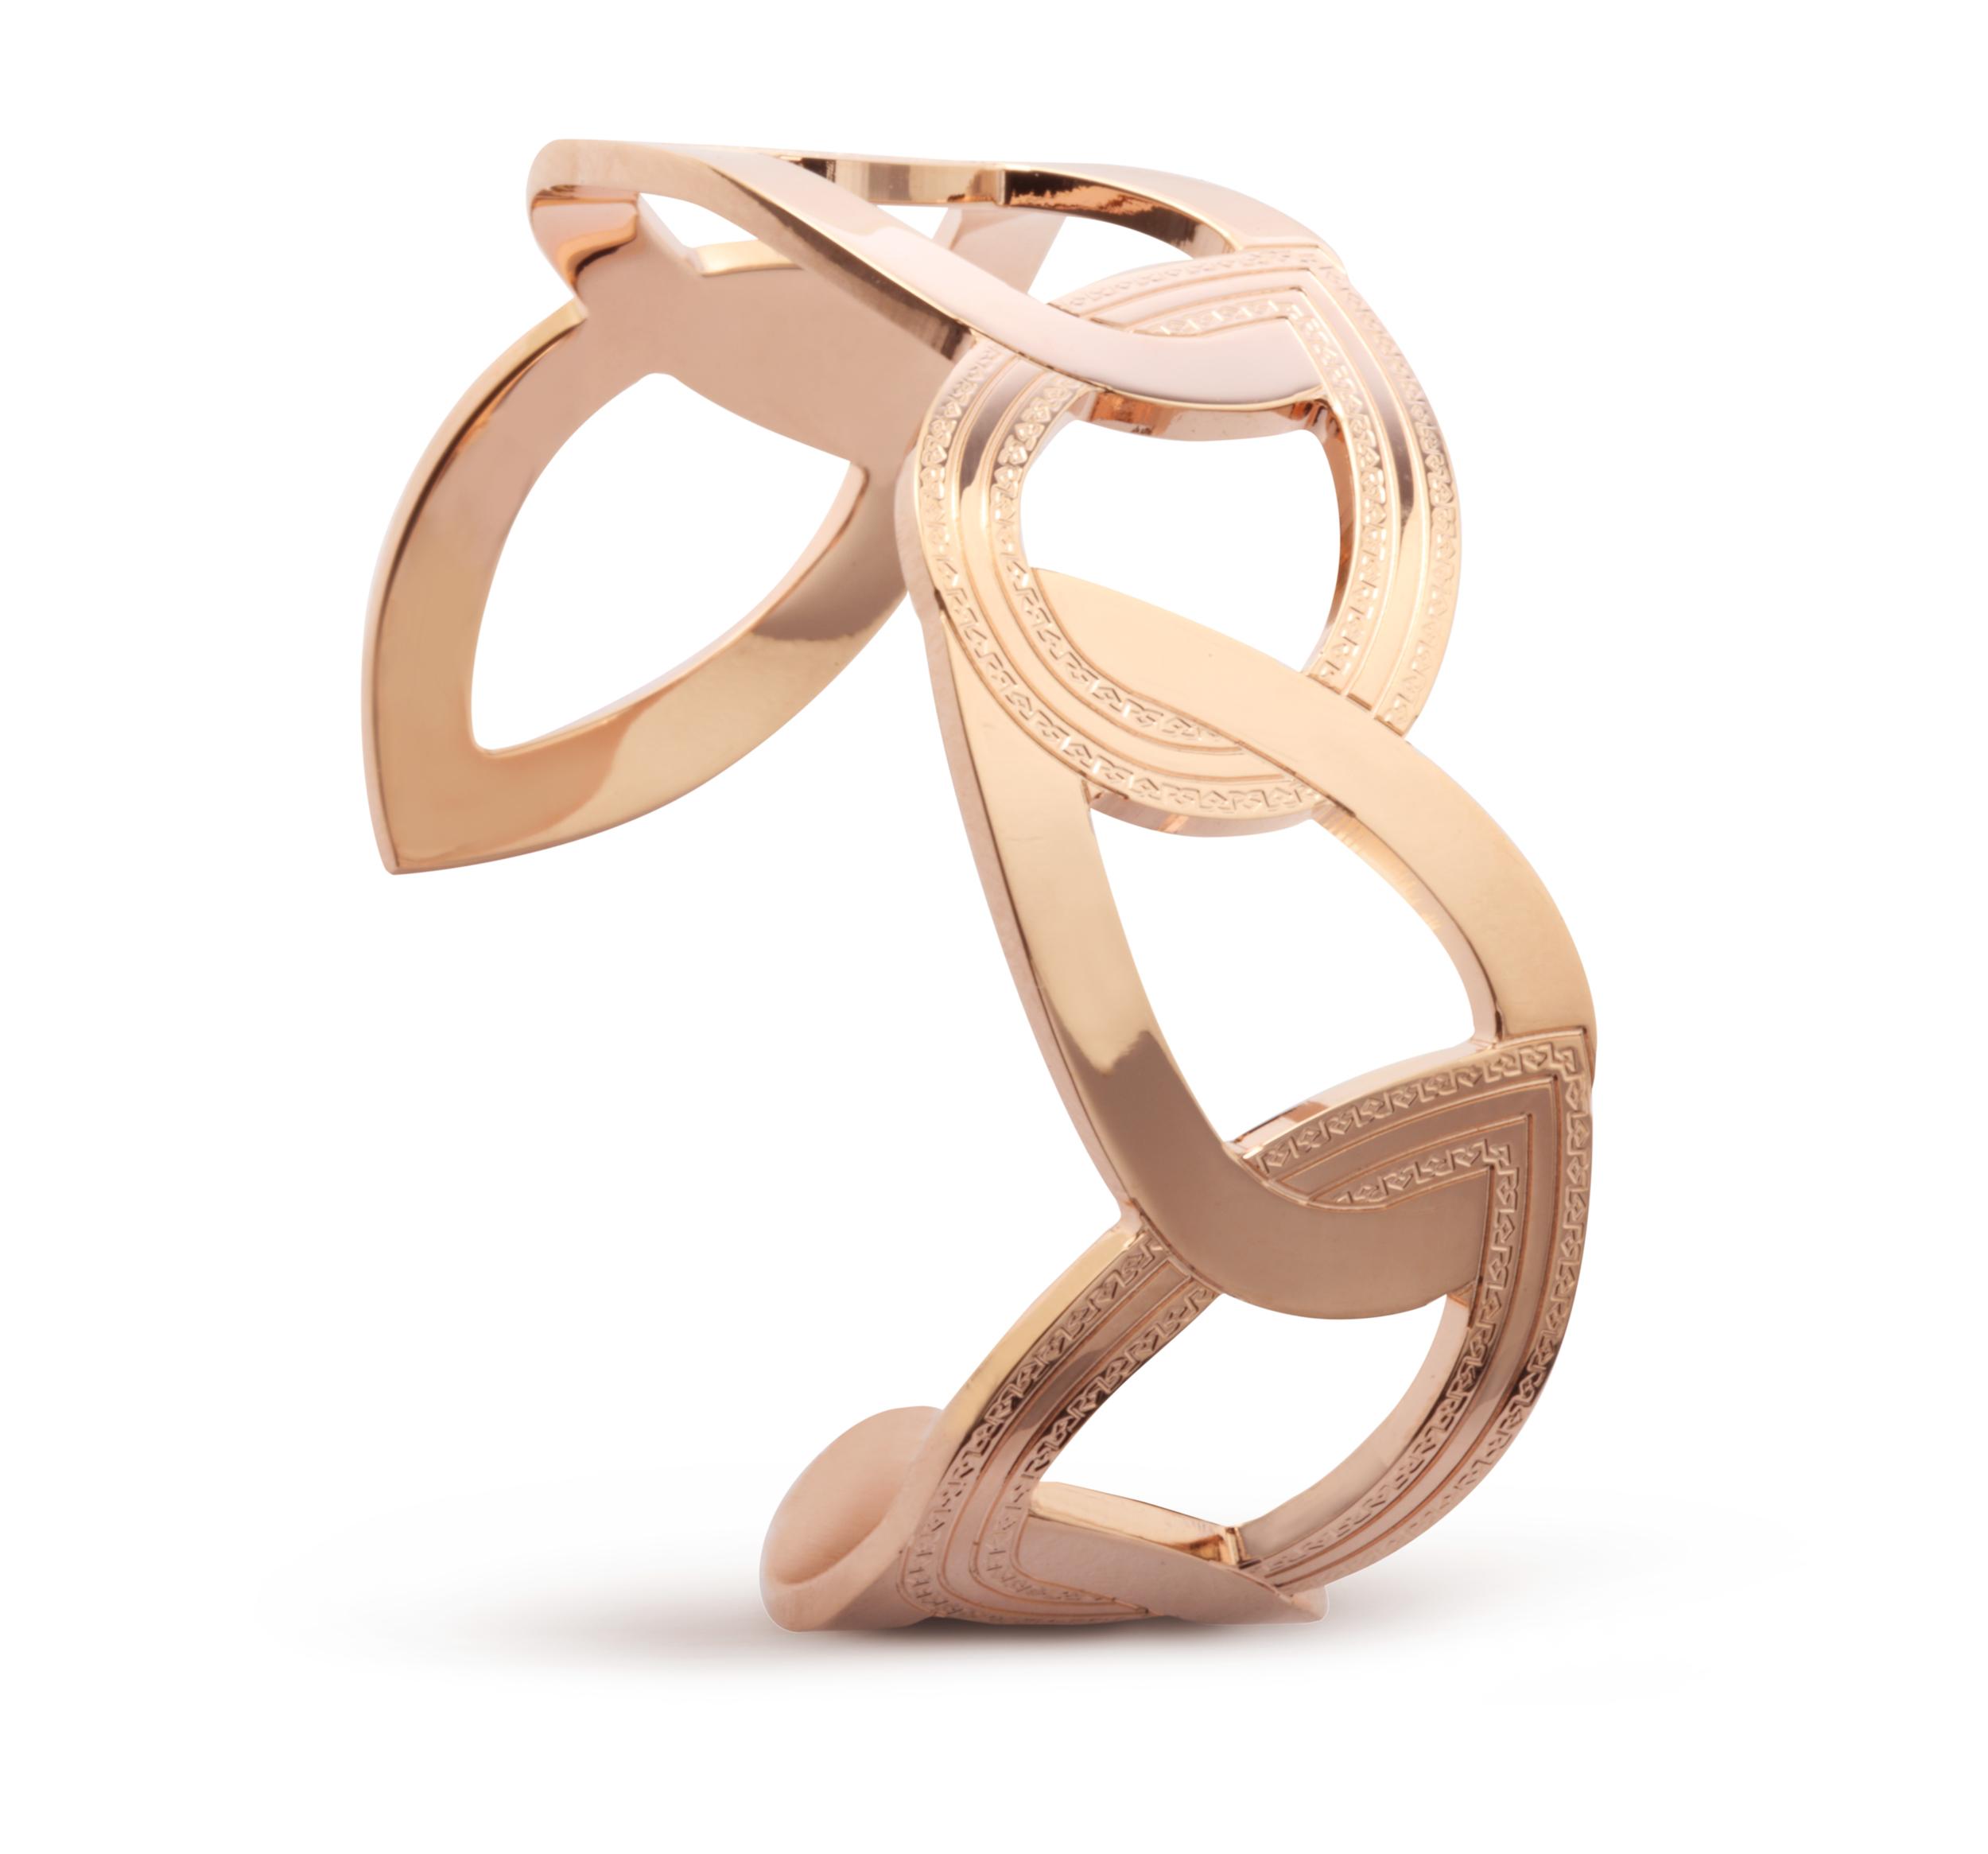 Rebecca Bracelet   Van Gundys   Camarillo Jeweler